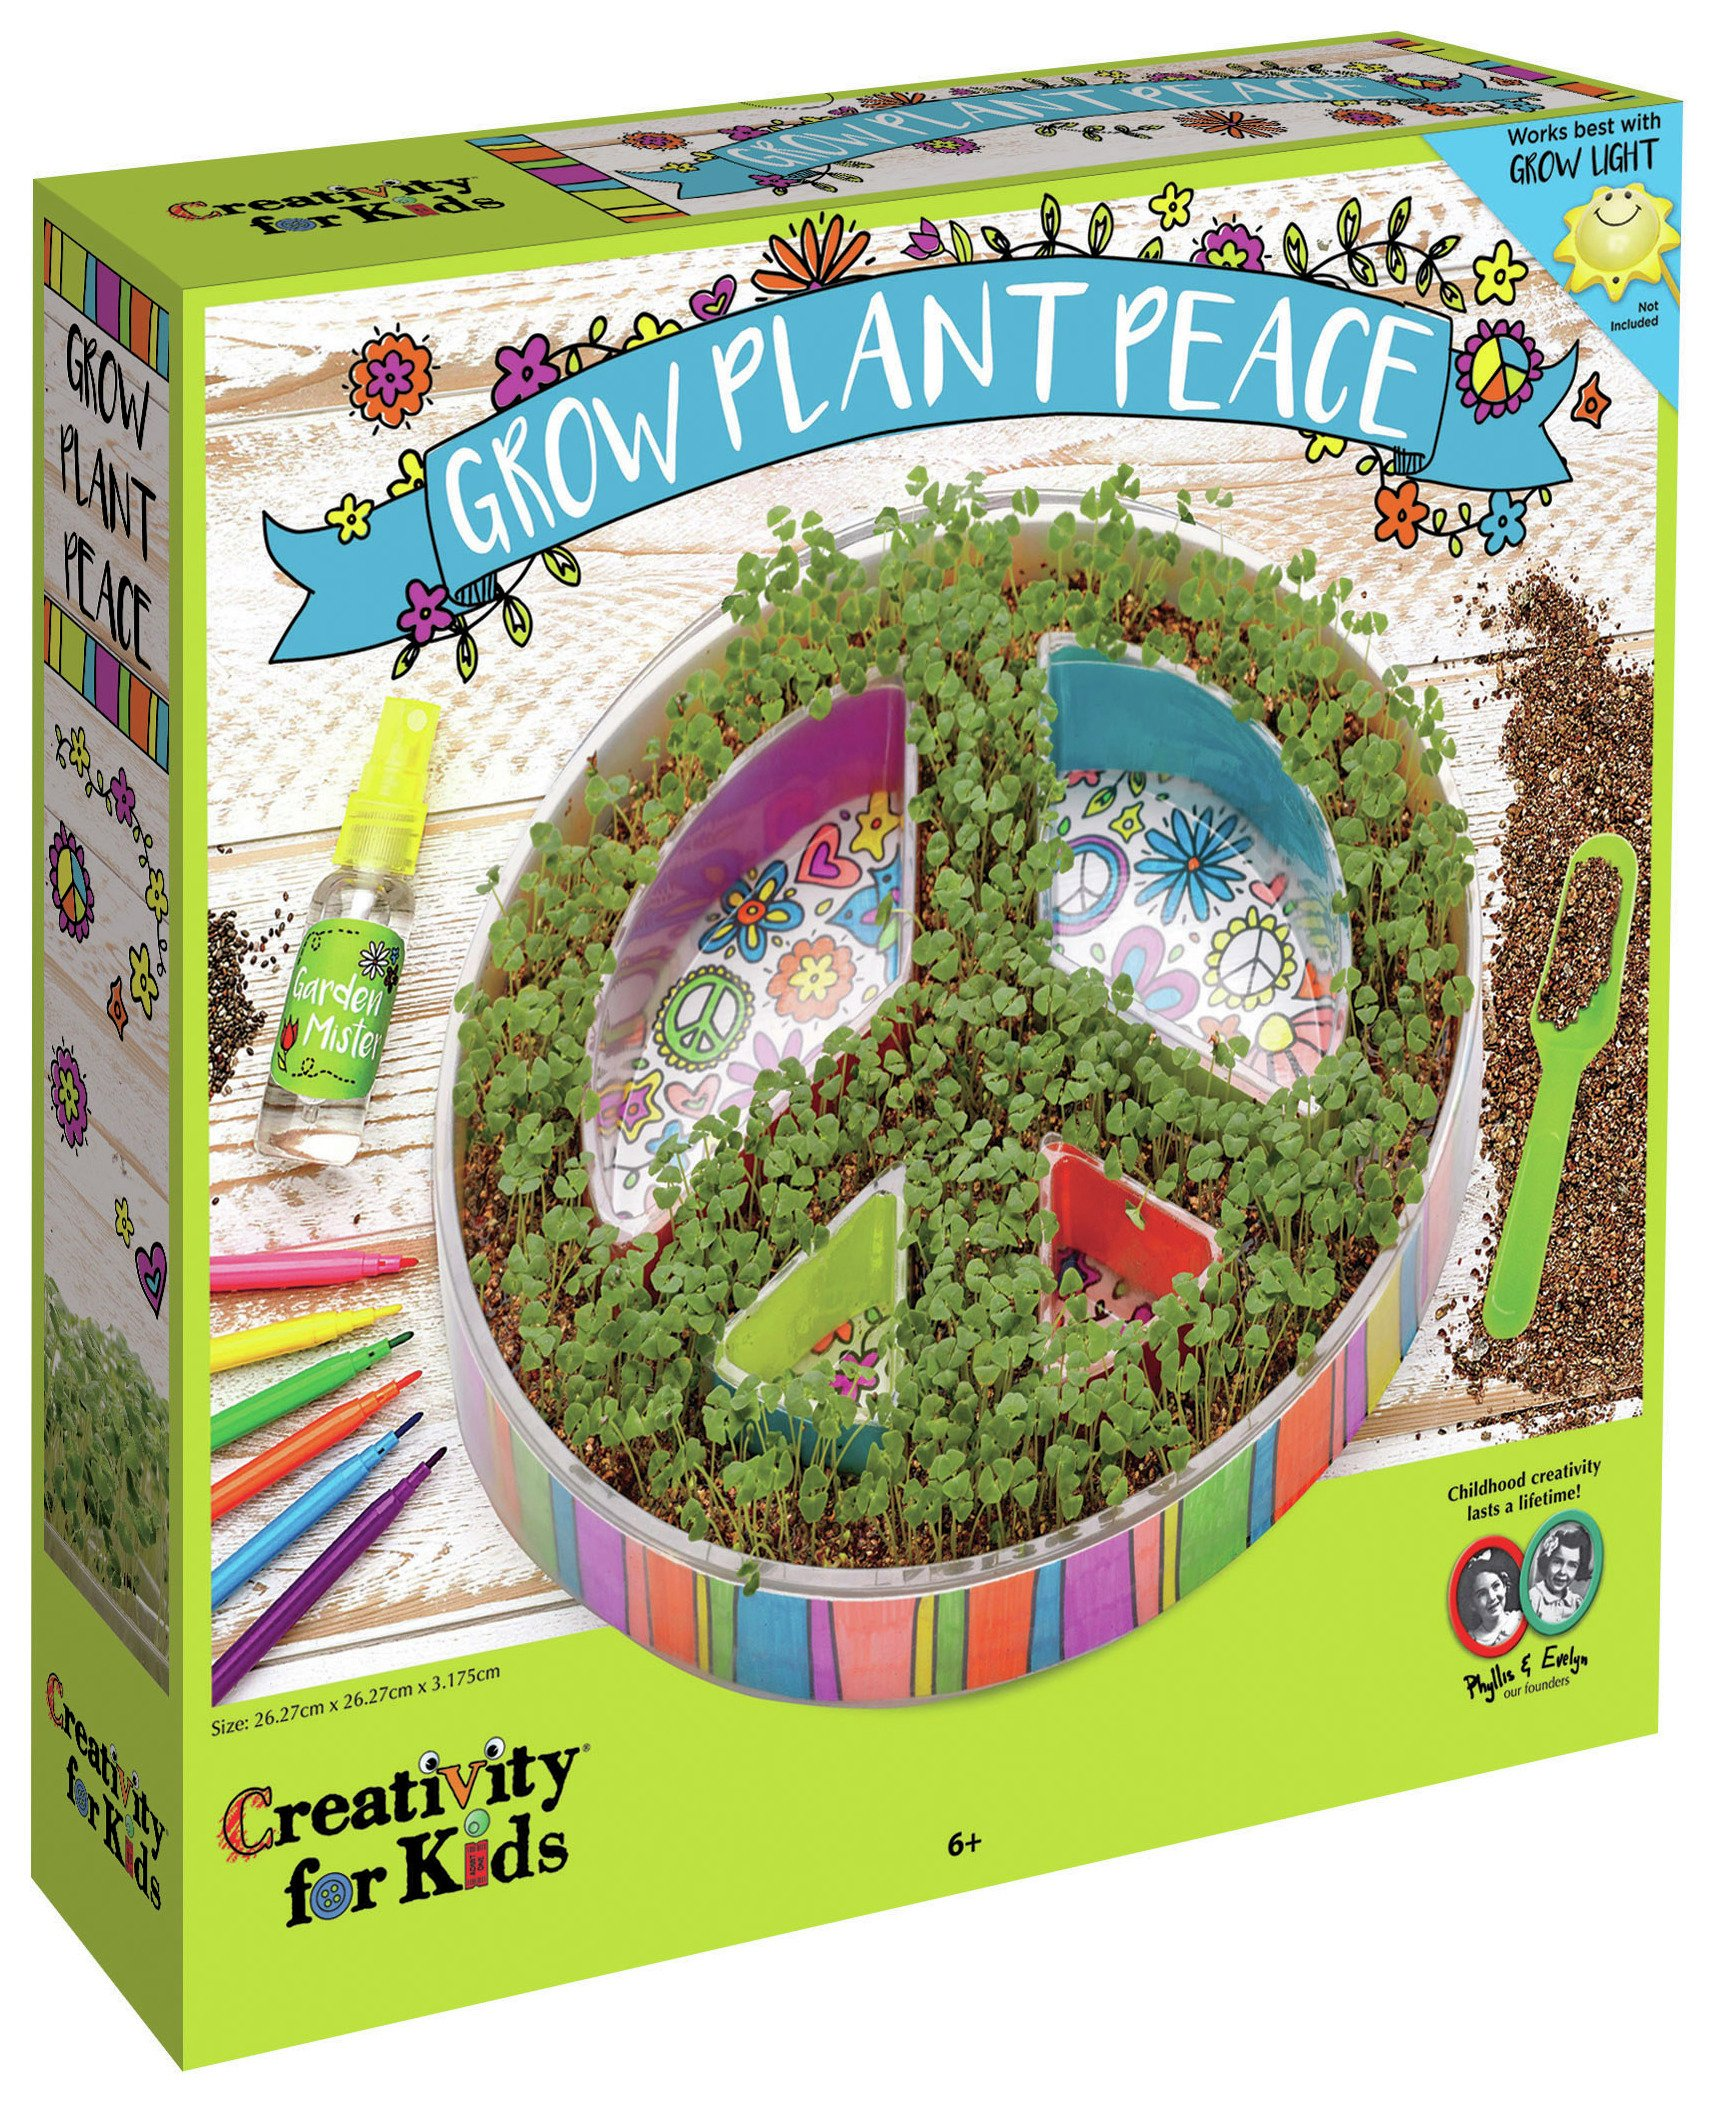 Creativity for Kids GROW Plant a Peace Garden Set.